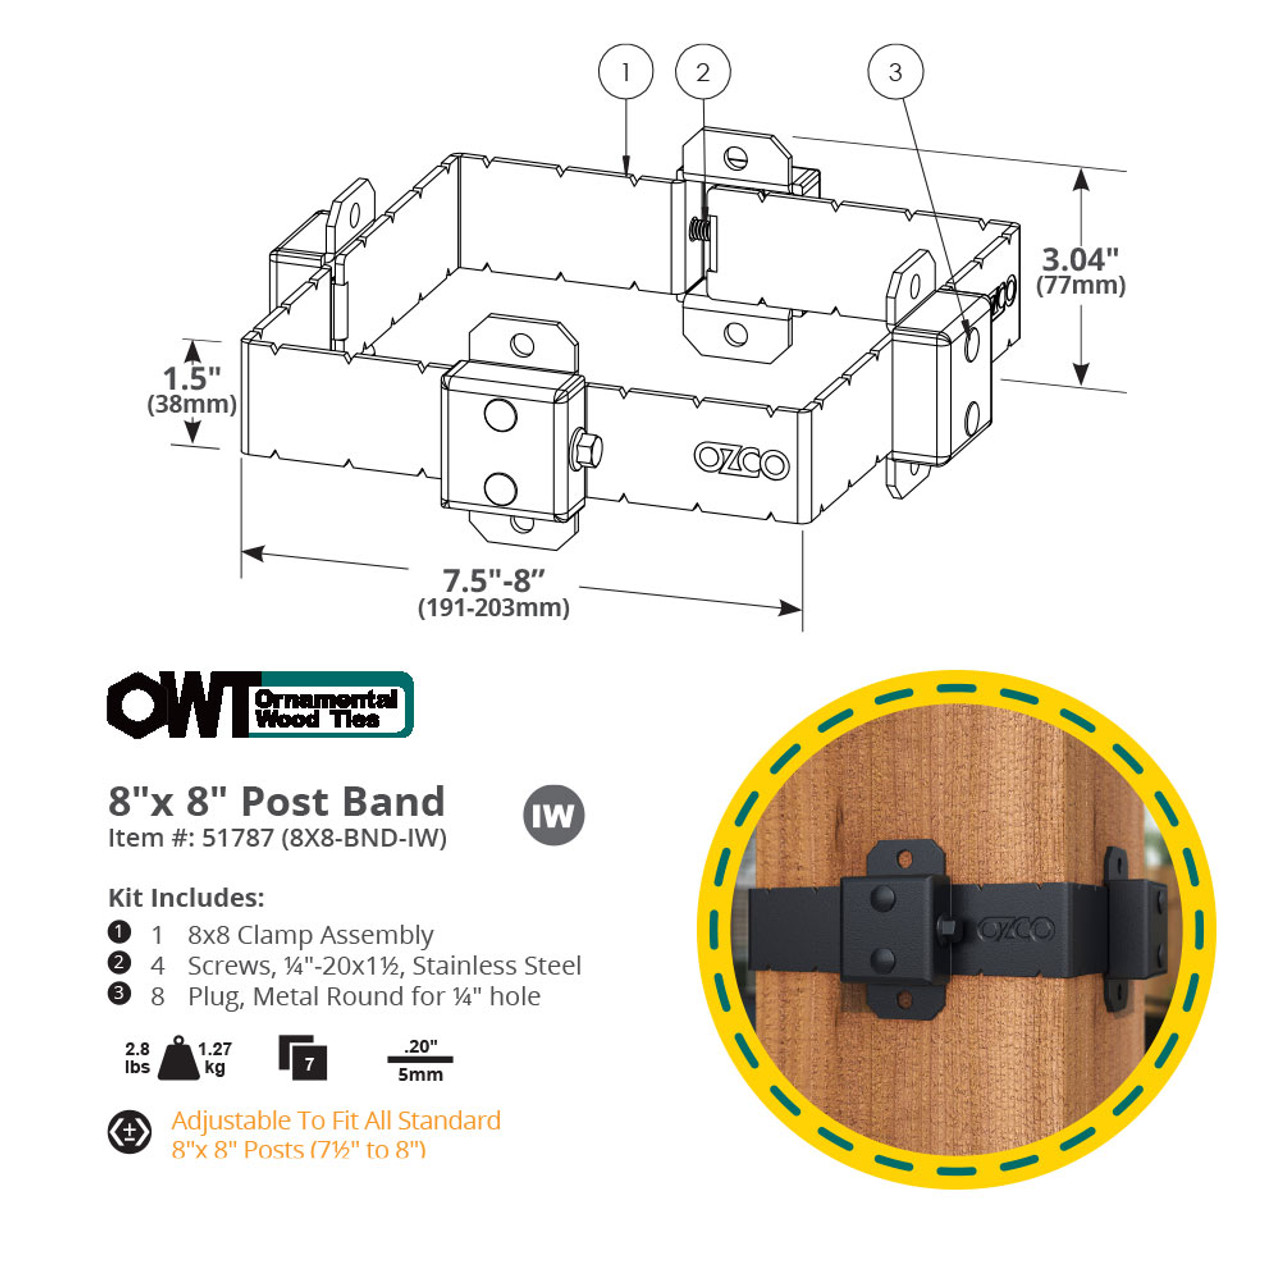 8 x 8 OZCO OWT Ironwood Post Band Spec Drawing